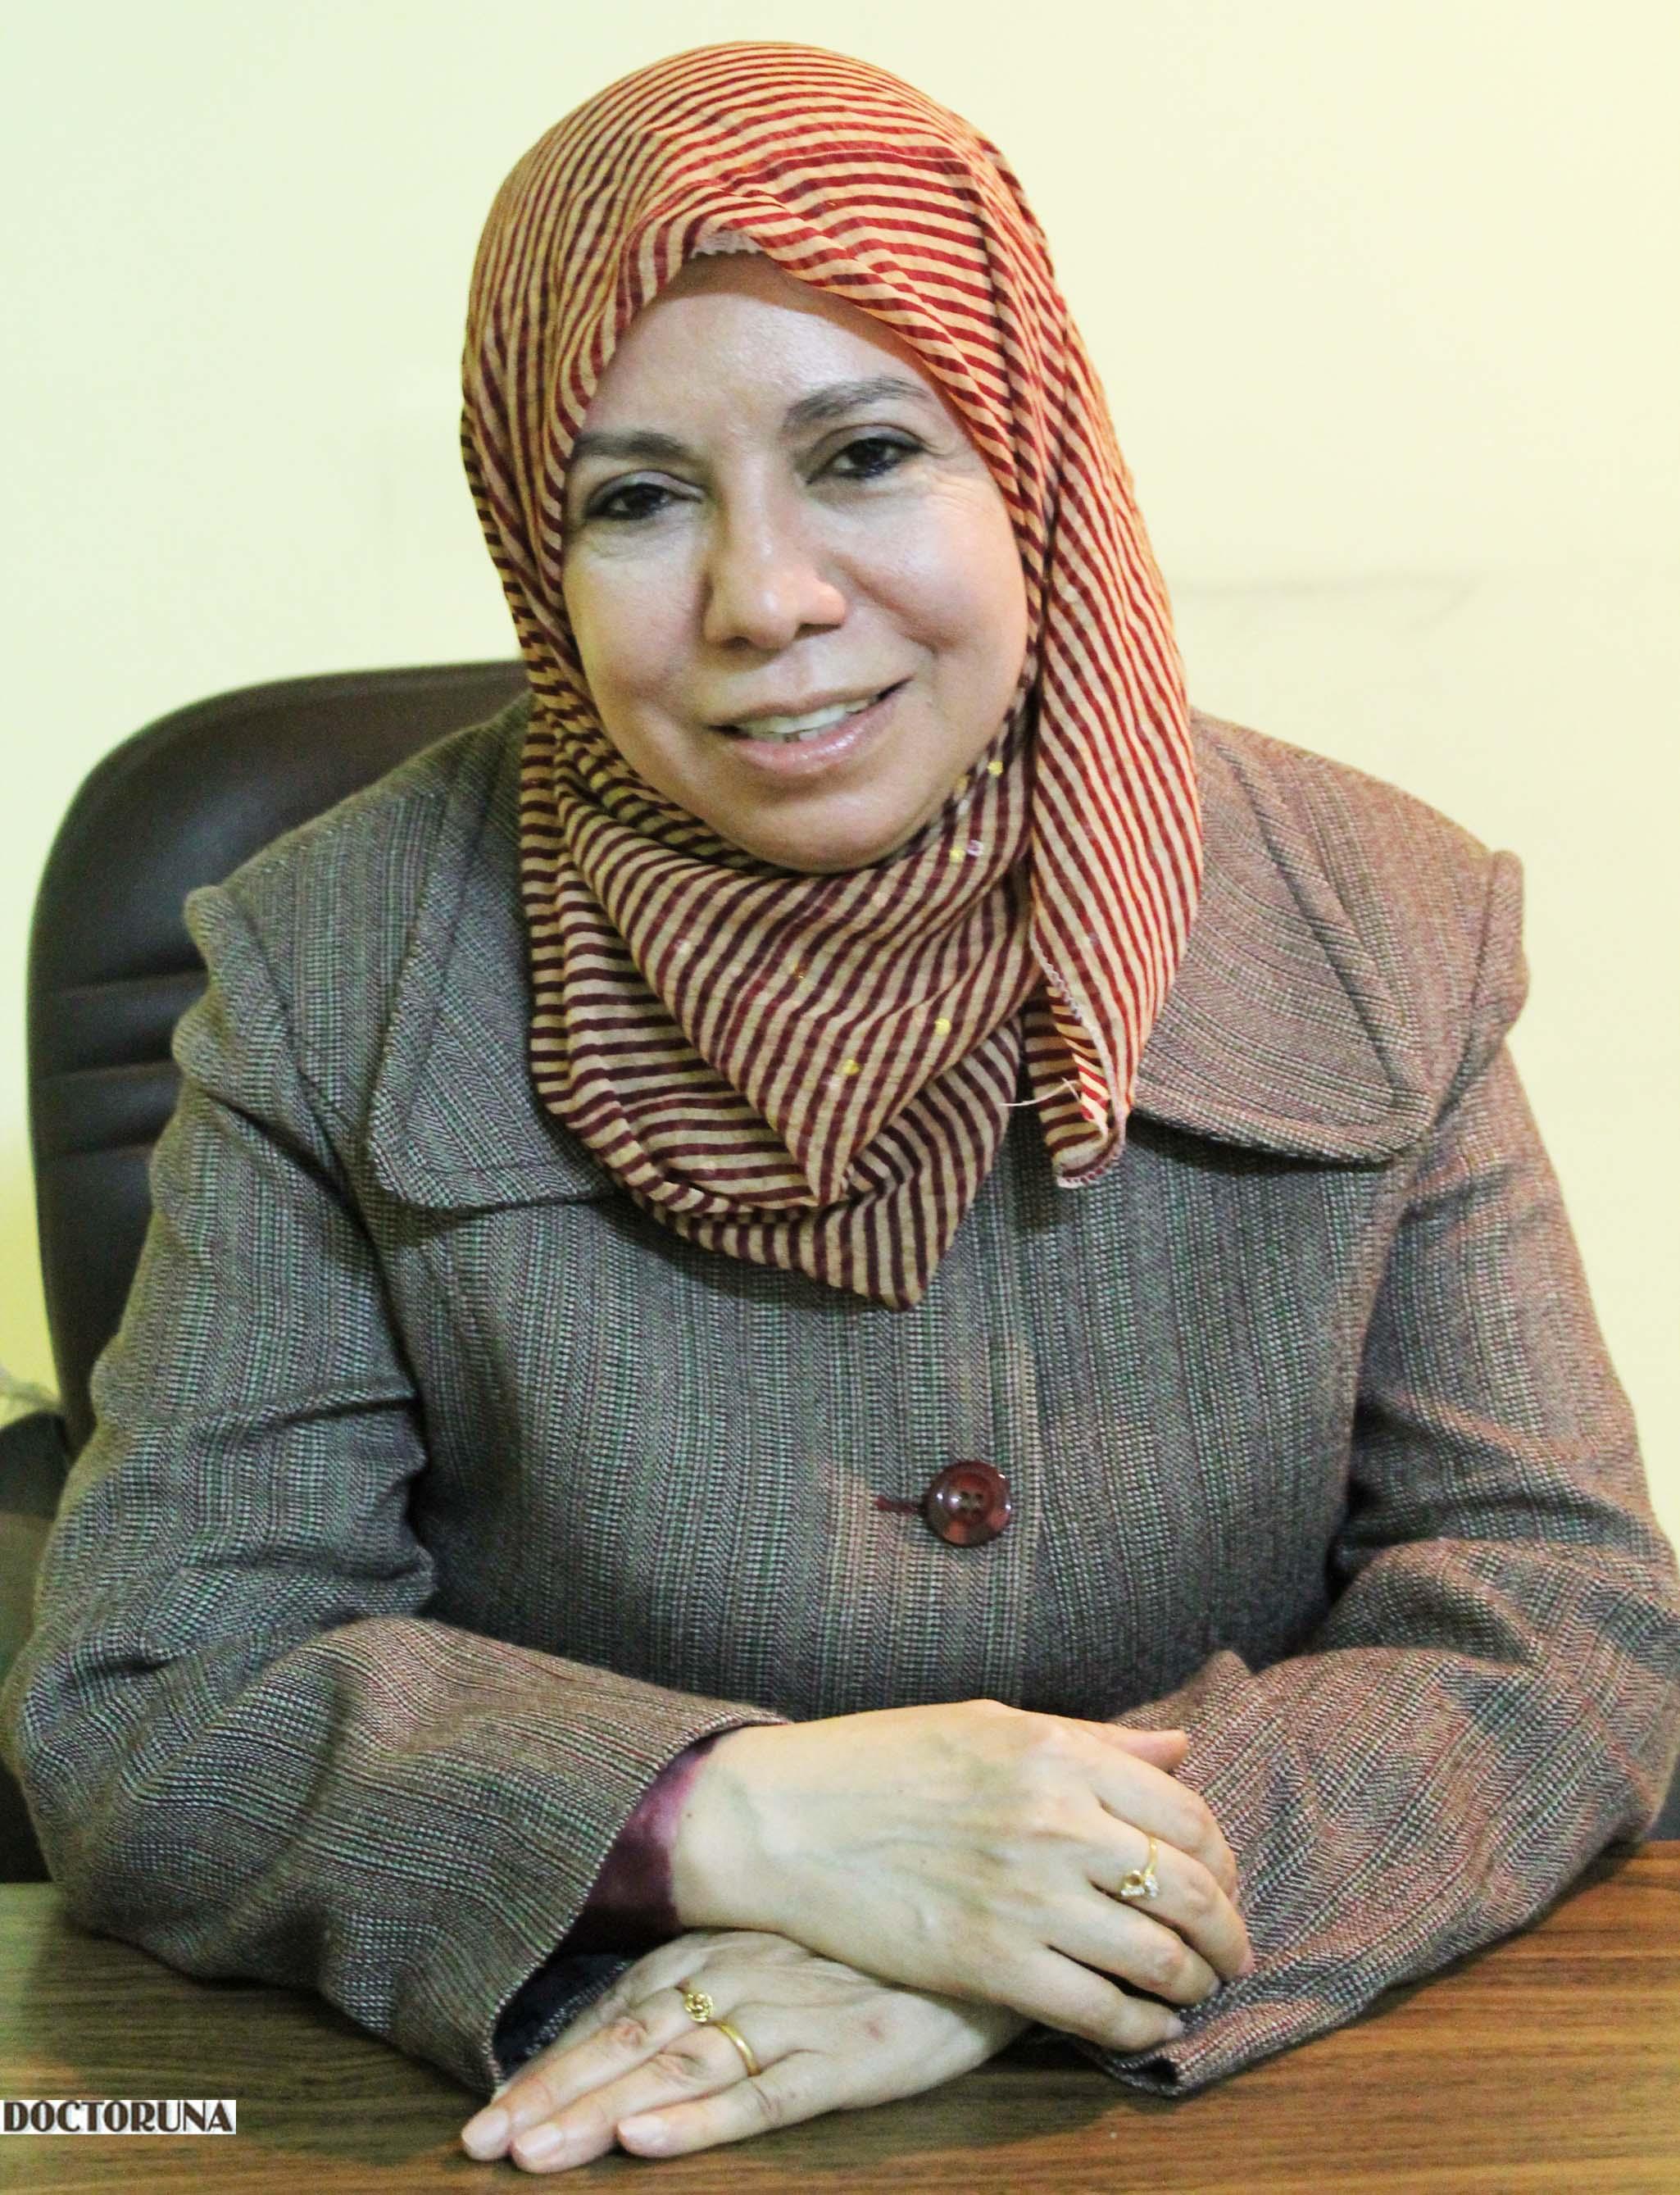 Best Diabetes in Children in Cairo, Egypt